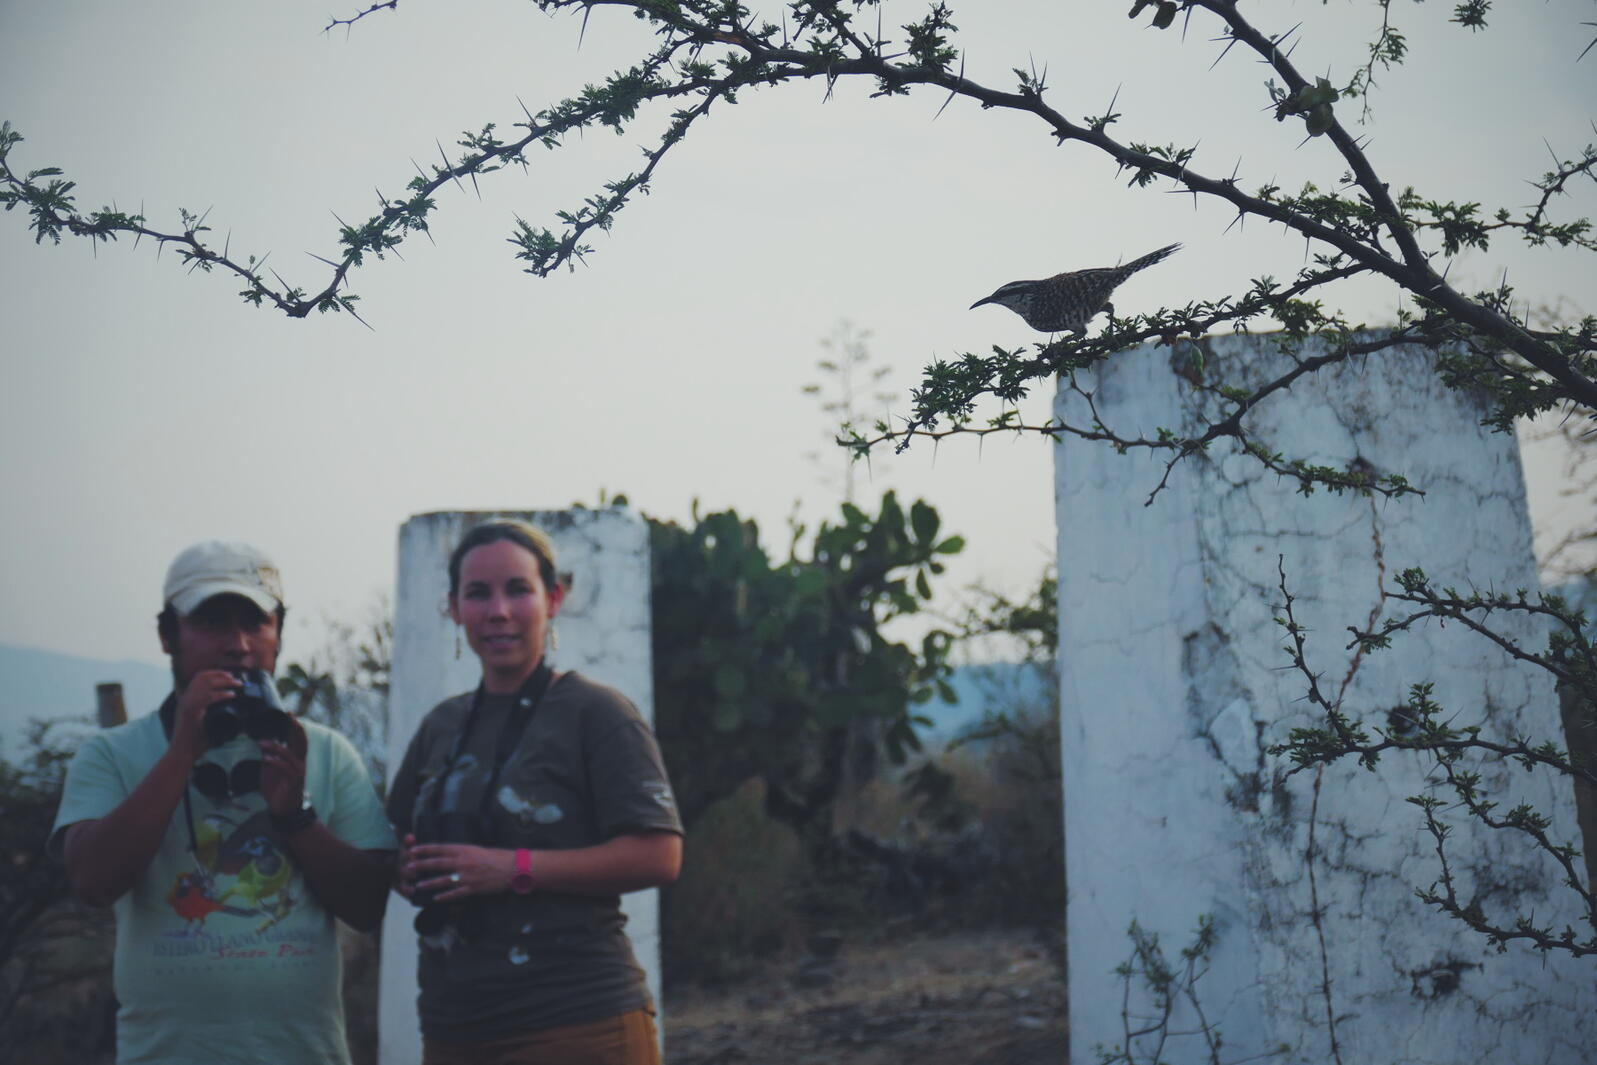 Eric and Jilly watch an endemic Boucard's Wren on the outskirts of Oaxaca. Noah Strycker